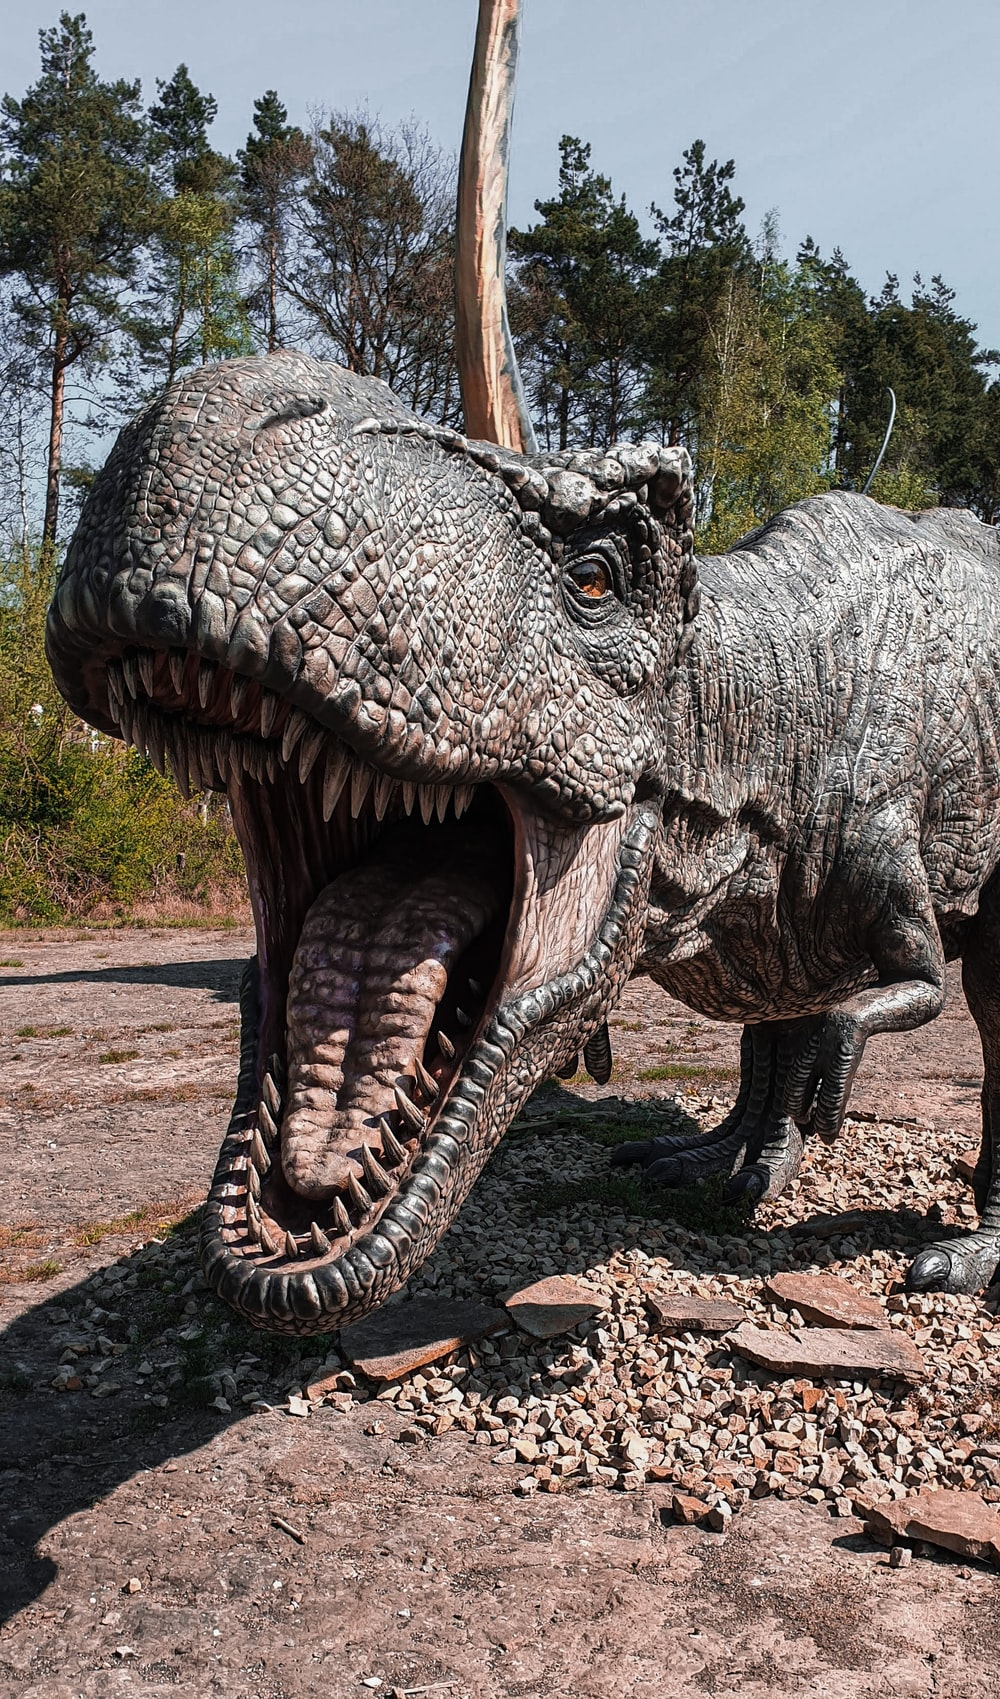 grey and black dinosaur statue